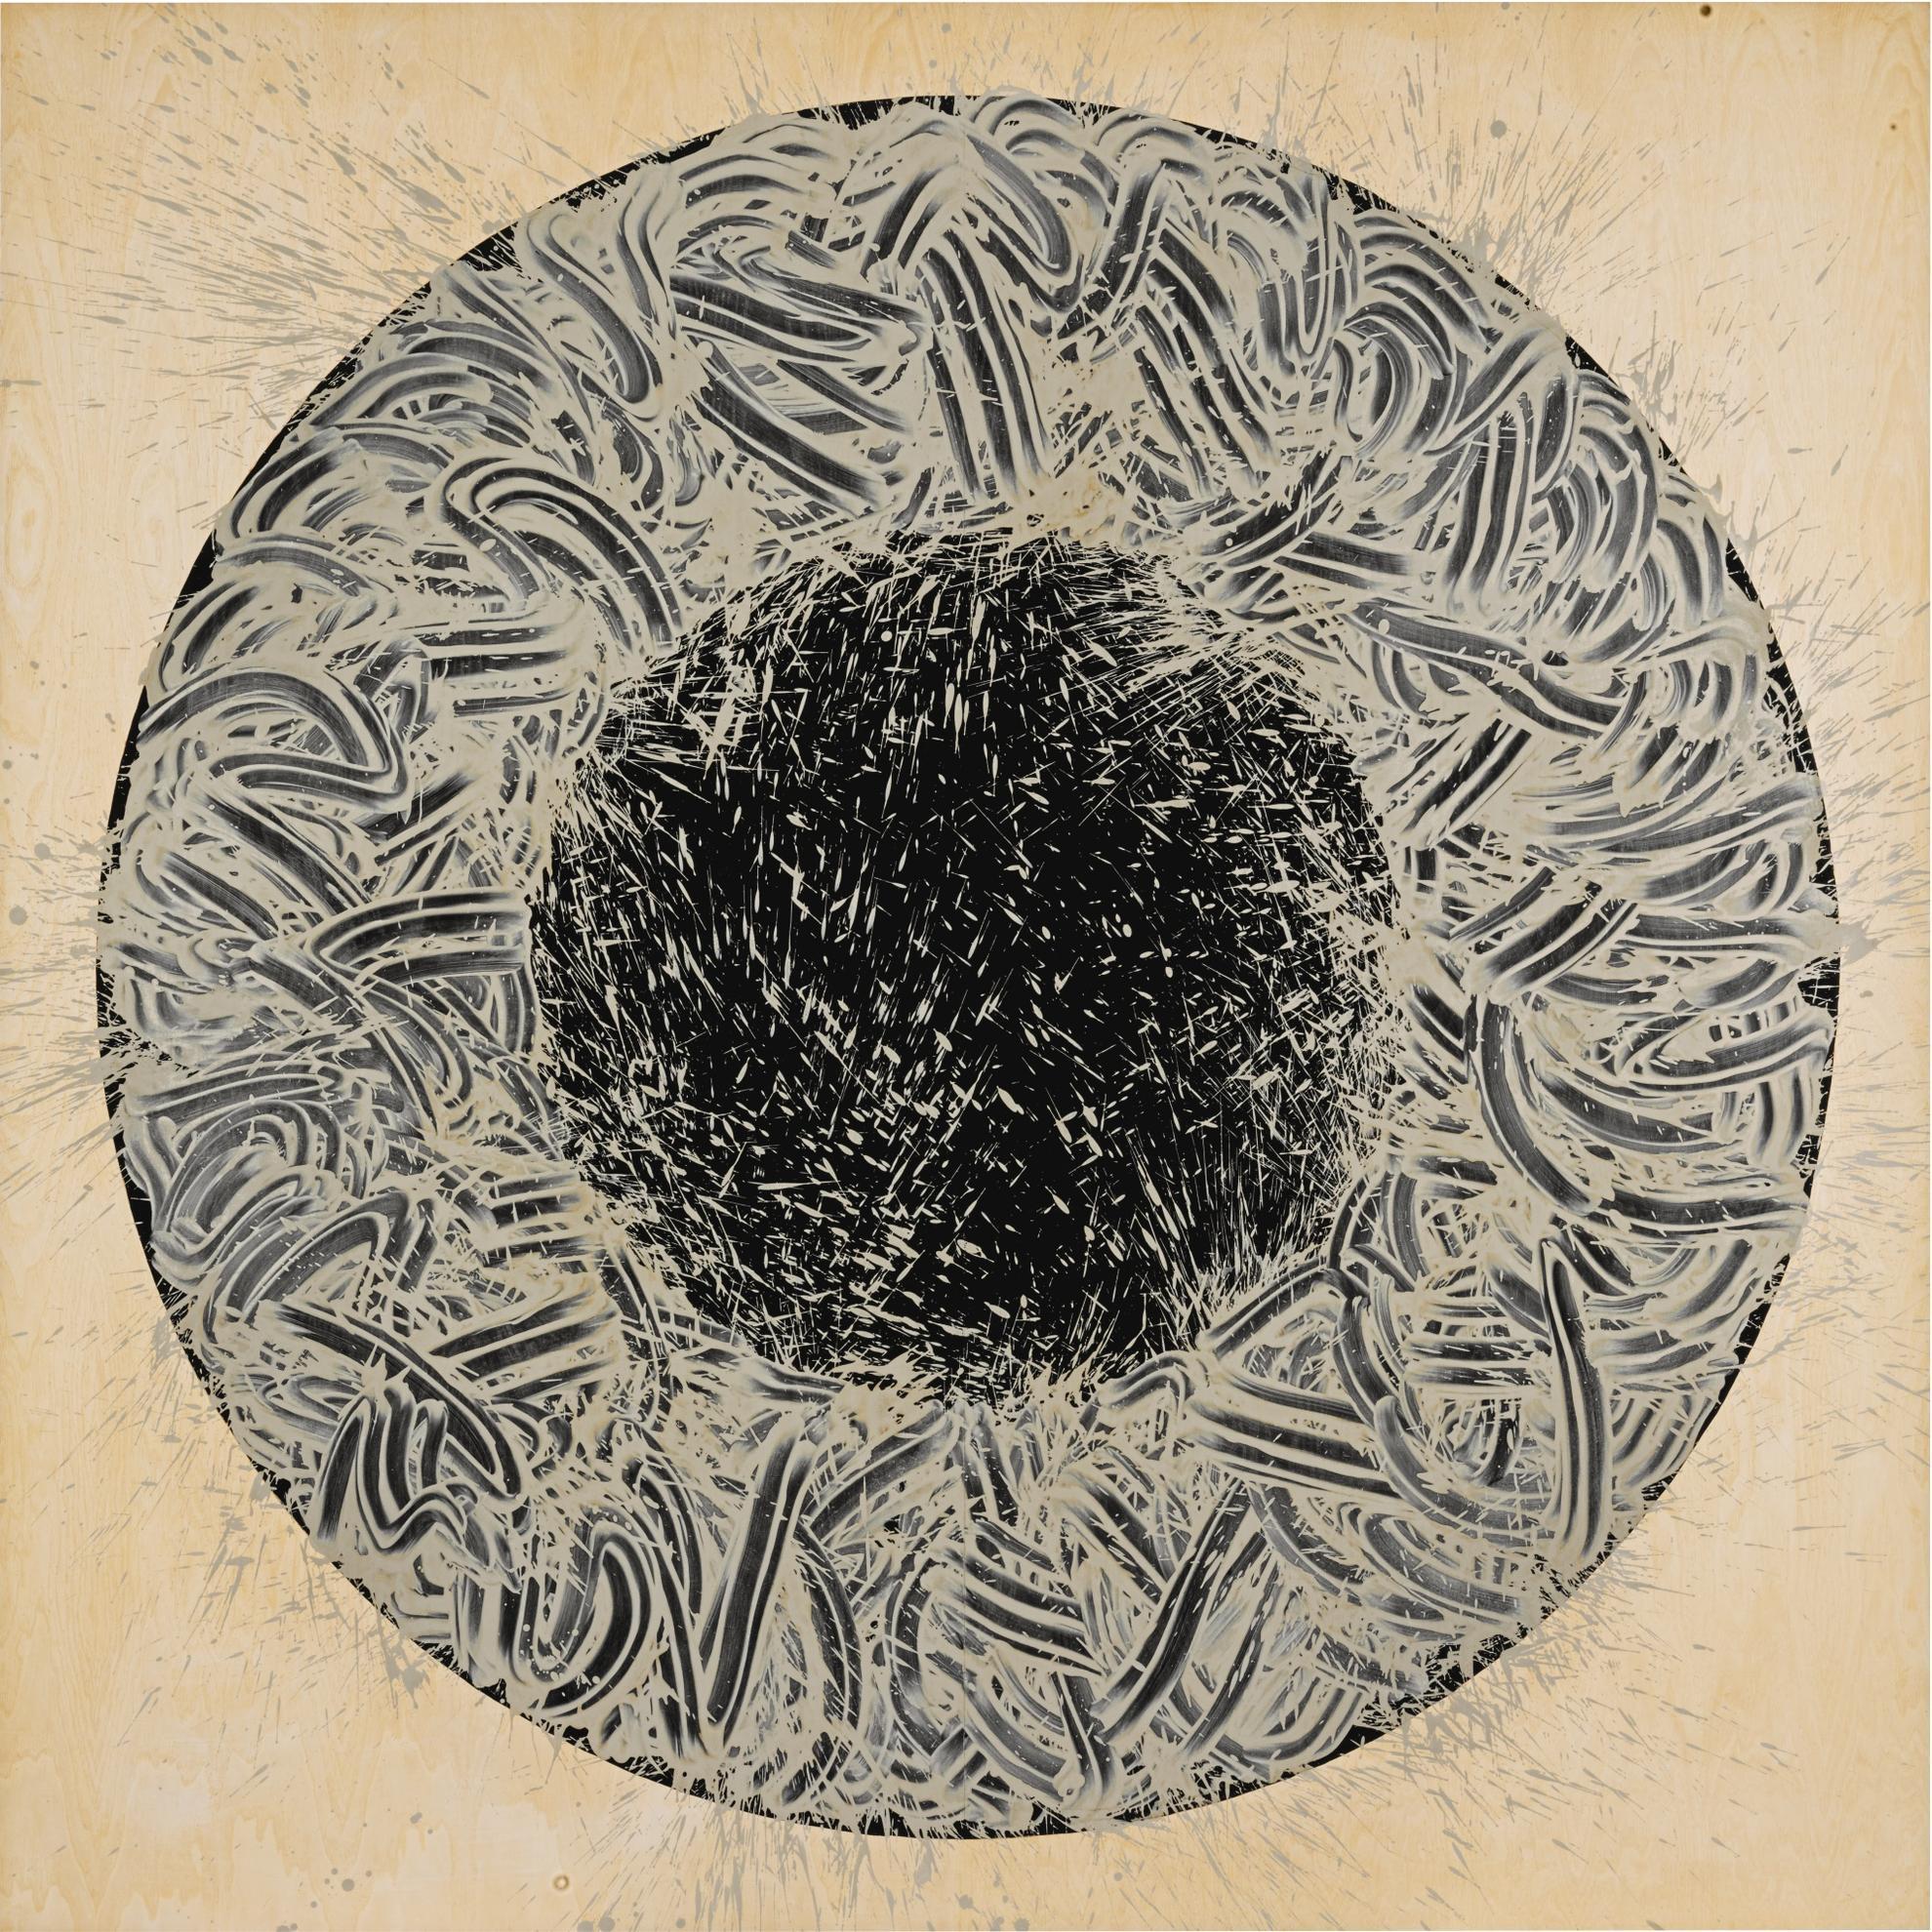 Richard Long-Untitled-2003